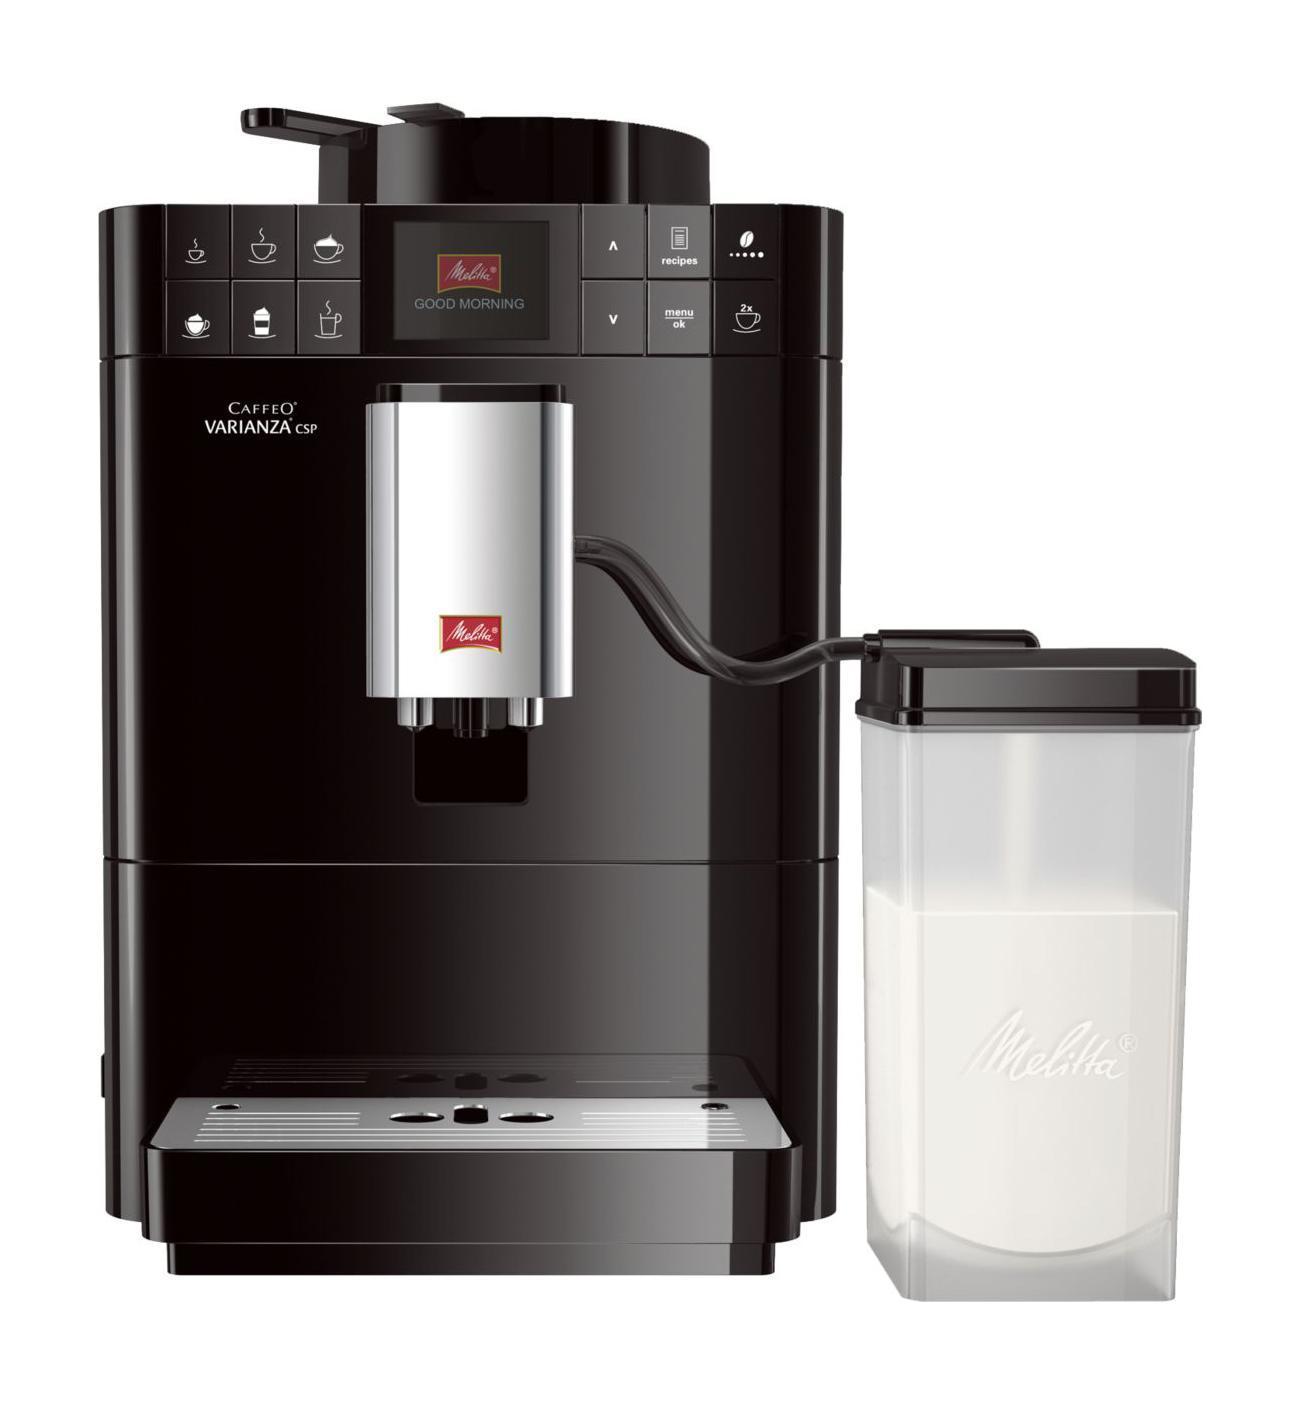 Melitta Caffeo F 570-102 Varianza CSP, Black кофемашина